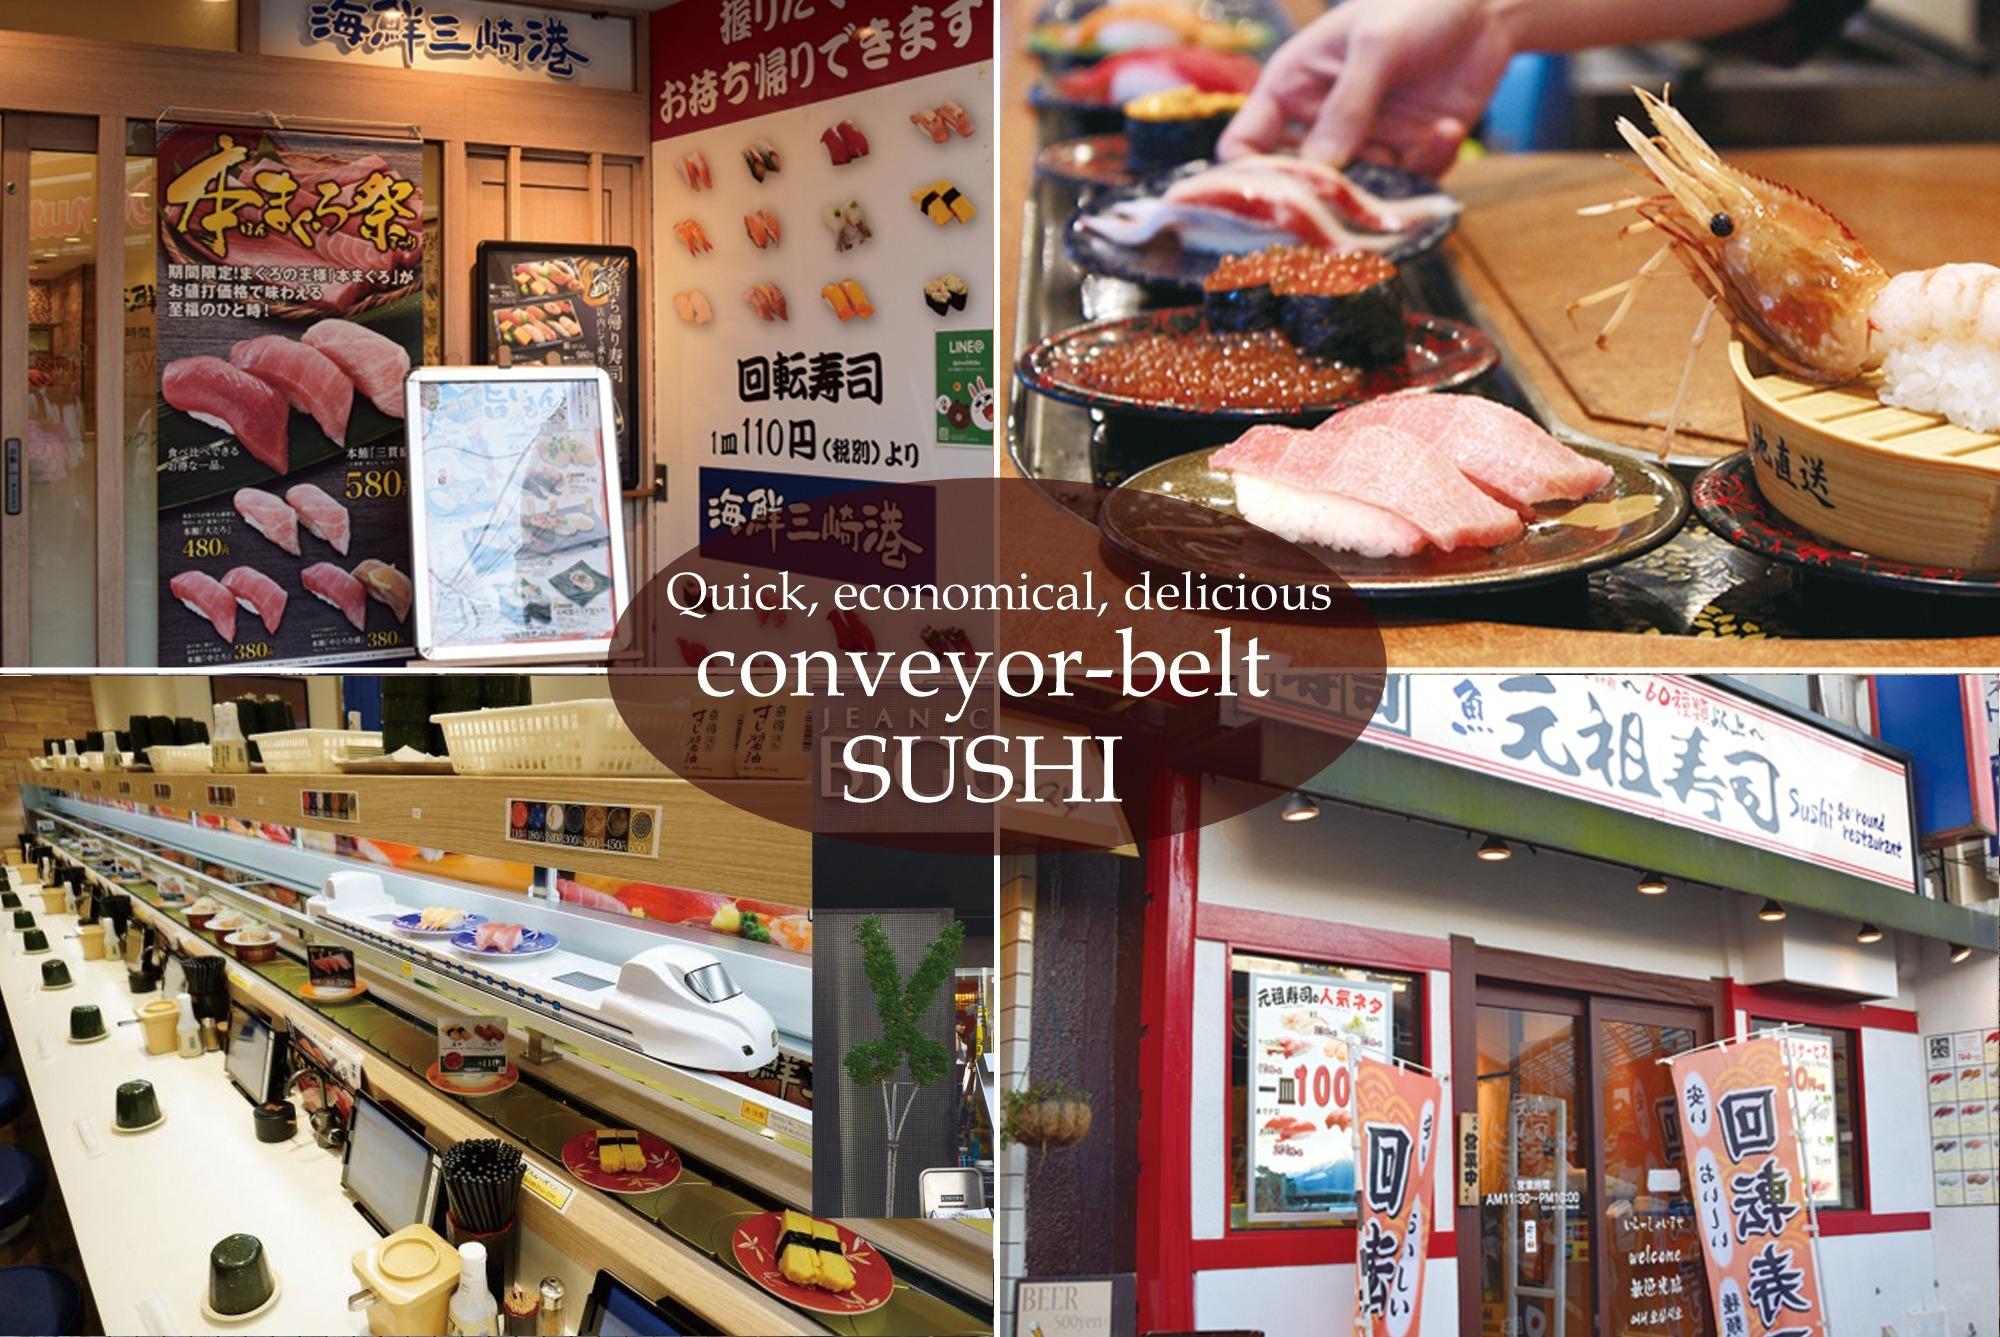 Cheap and delicious! Popular sushi restaurant in Shimokitazawa.